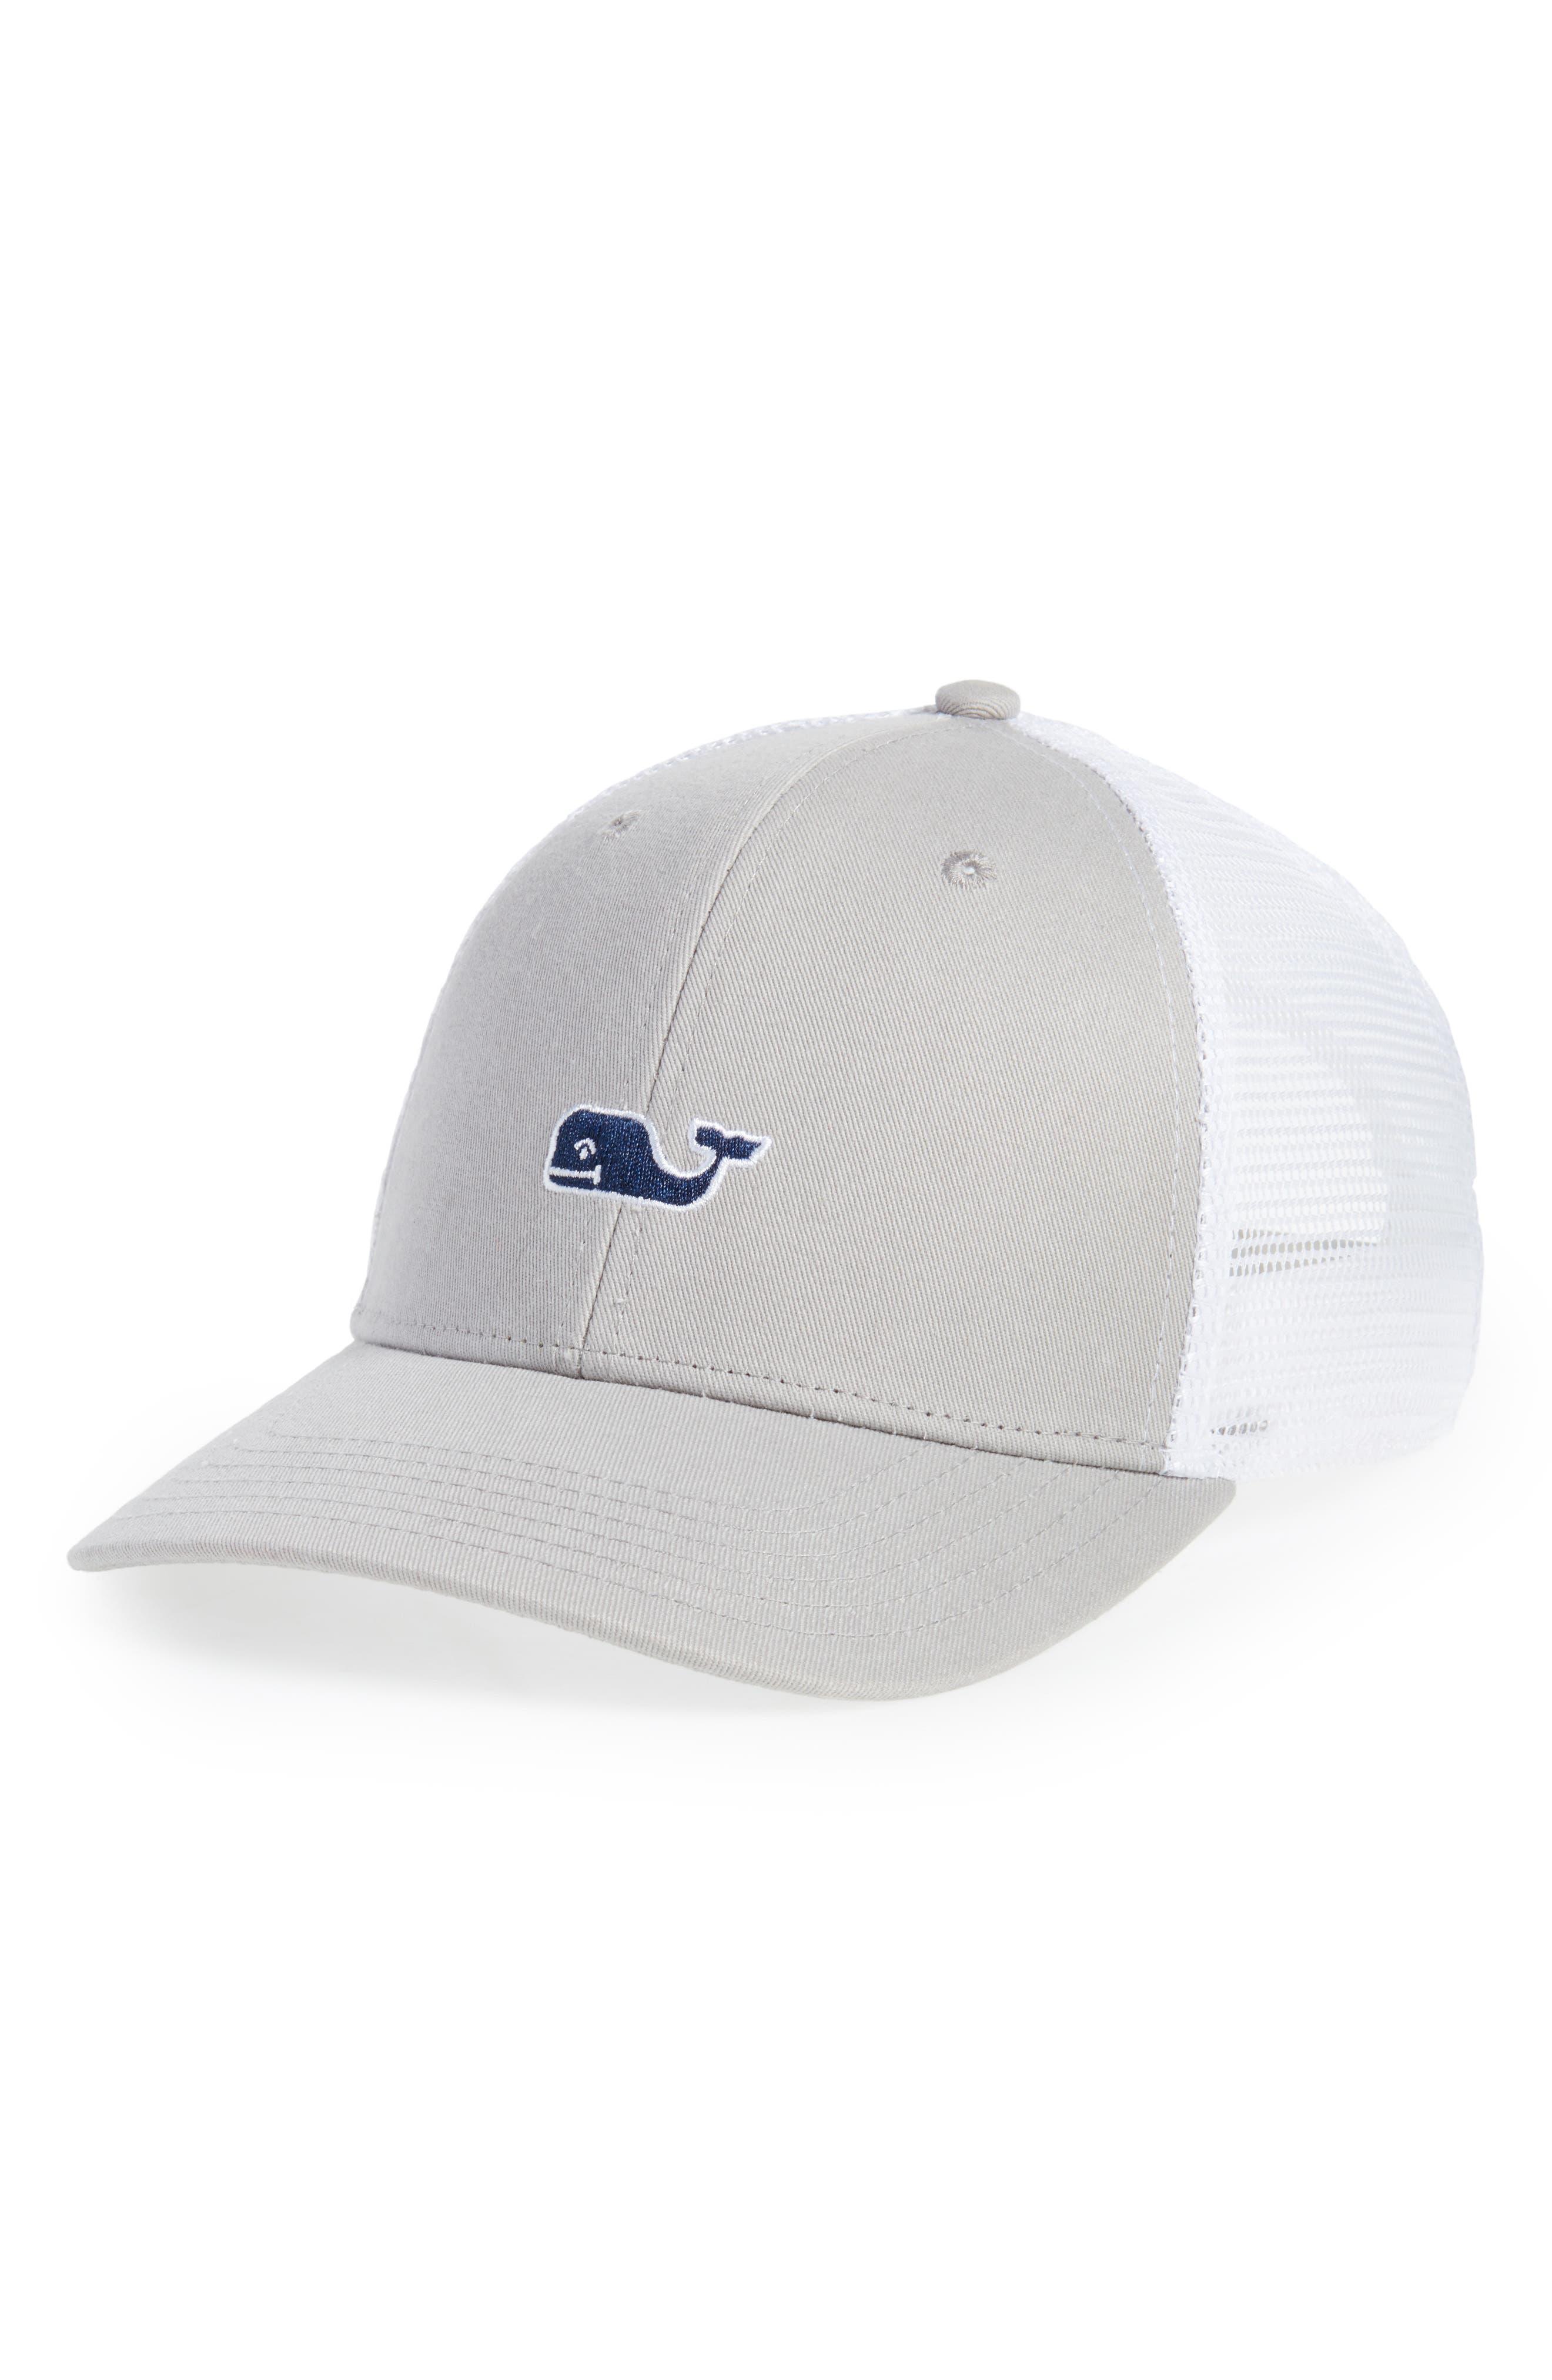 High Profile Trucker Hat,                             Main thumbnail 1, color,                             061